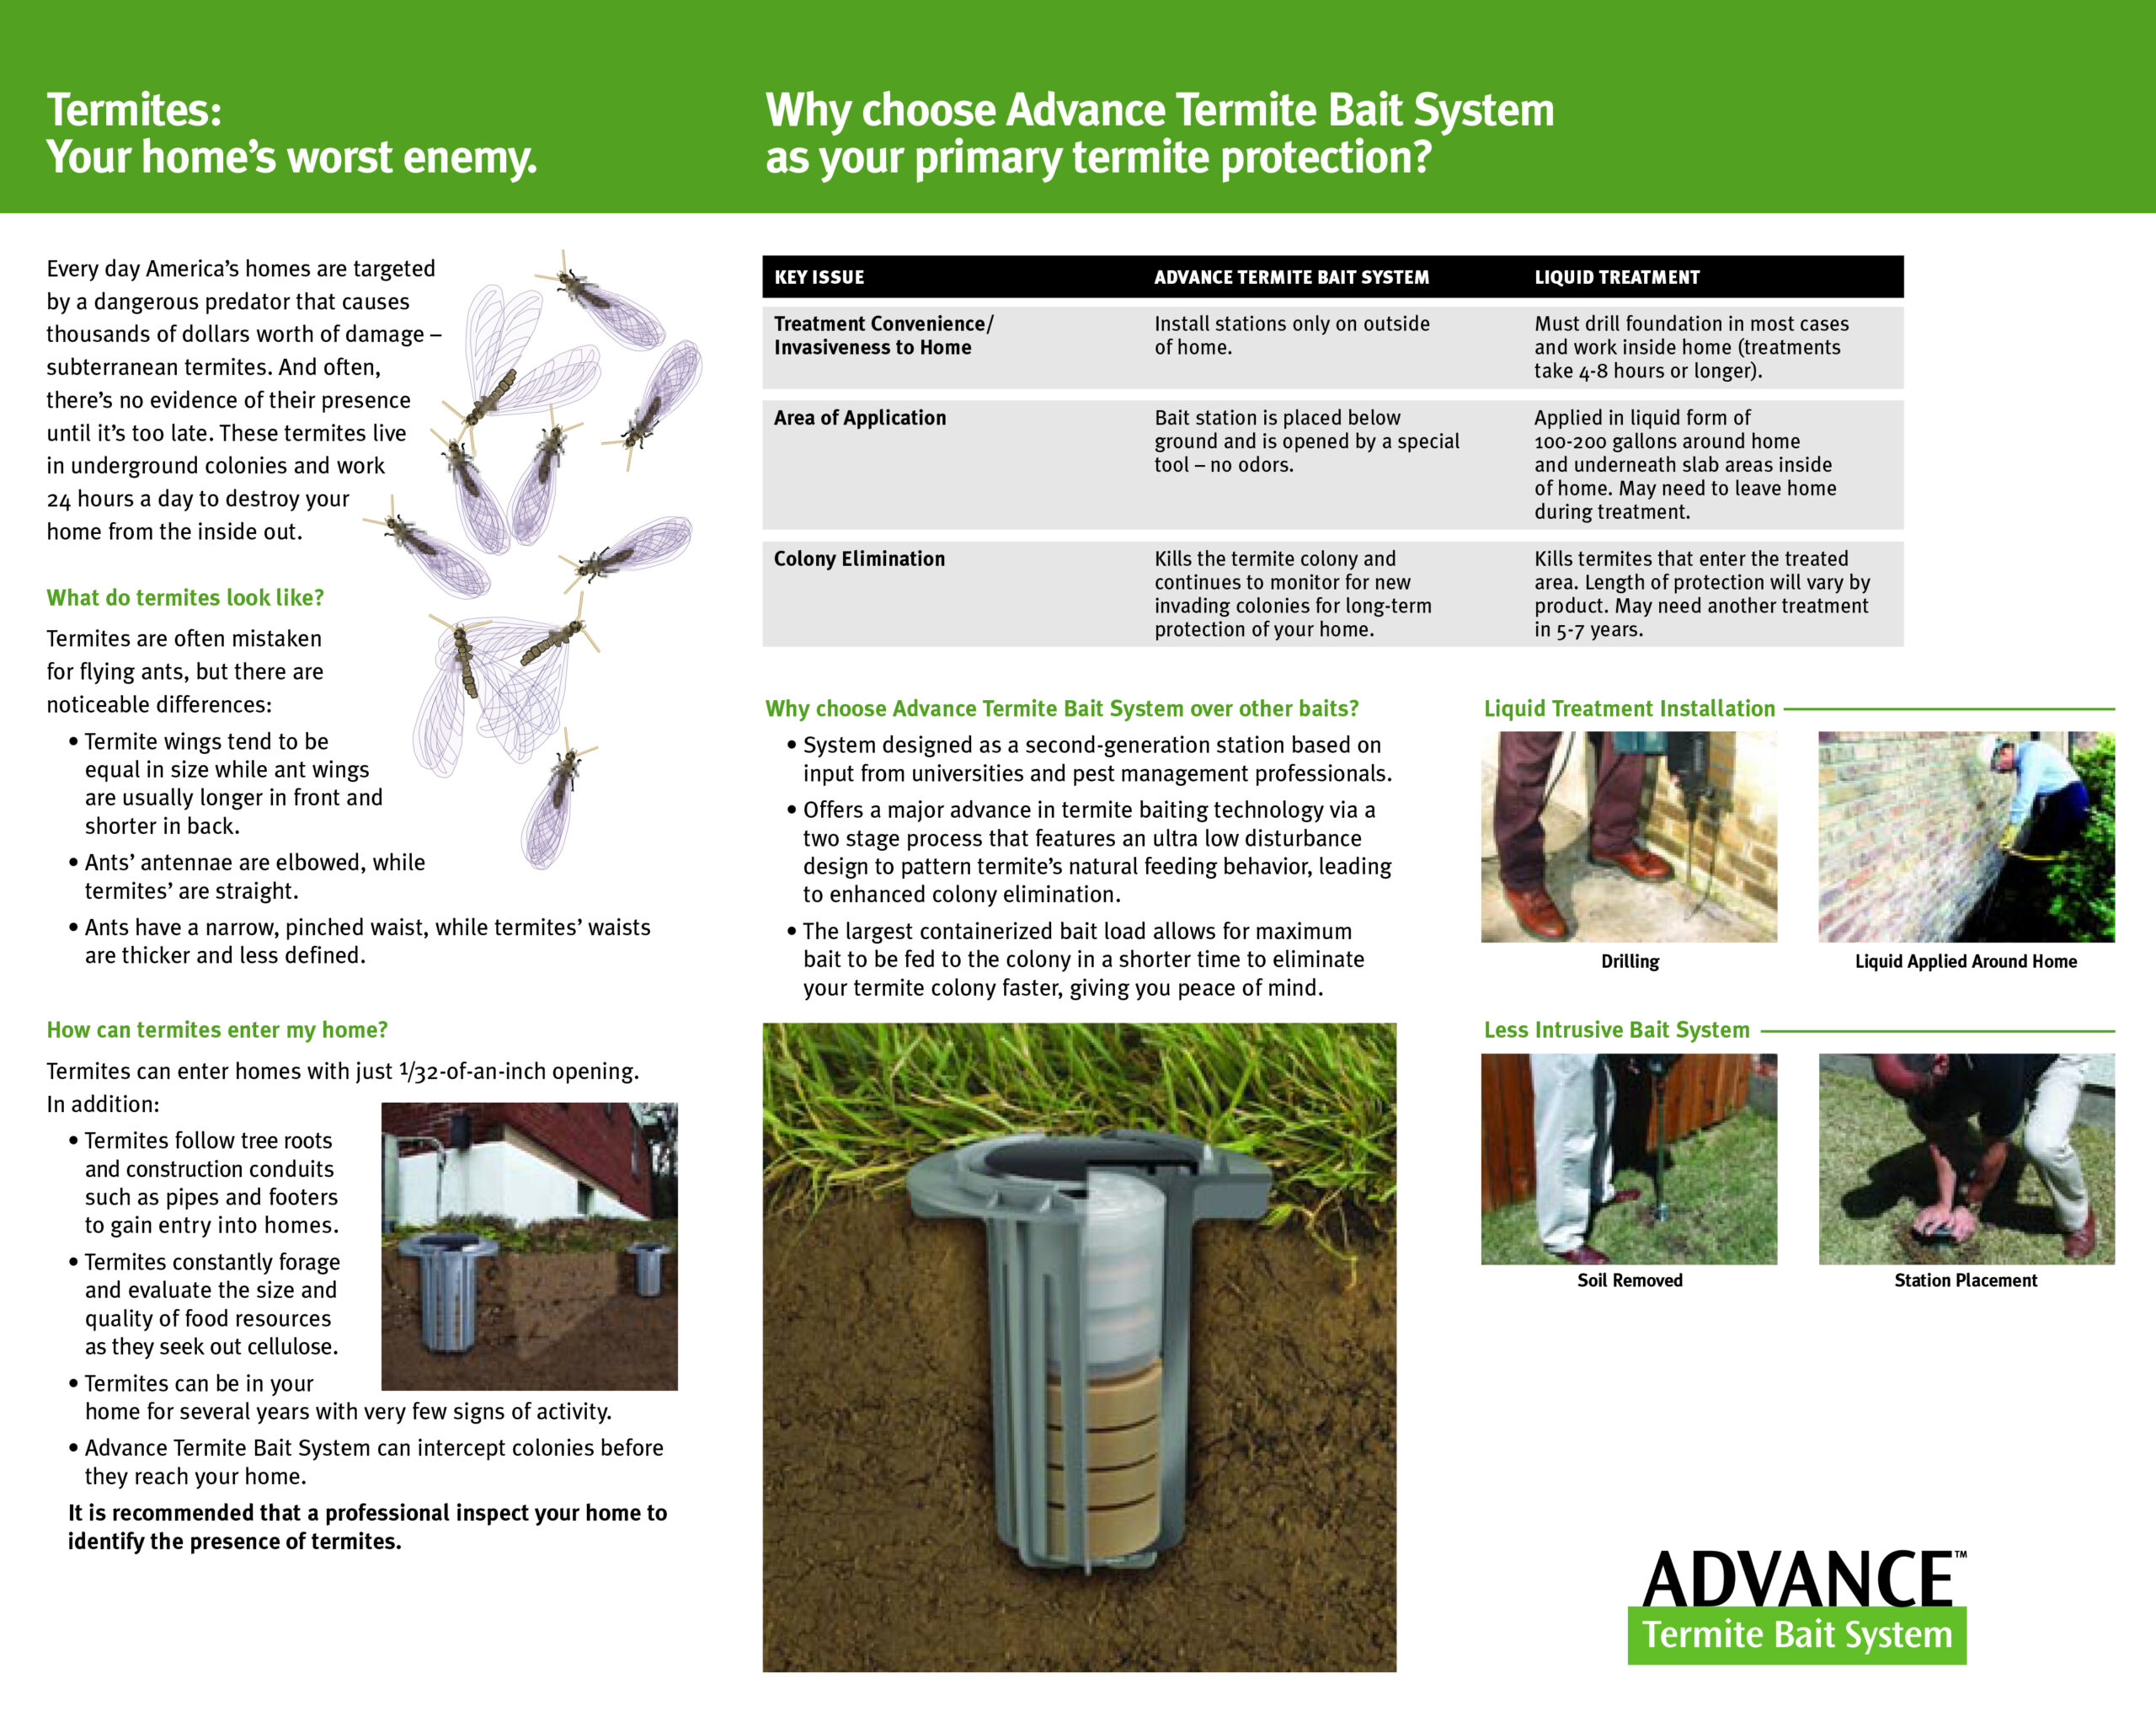 Advanced Termite Bait System